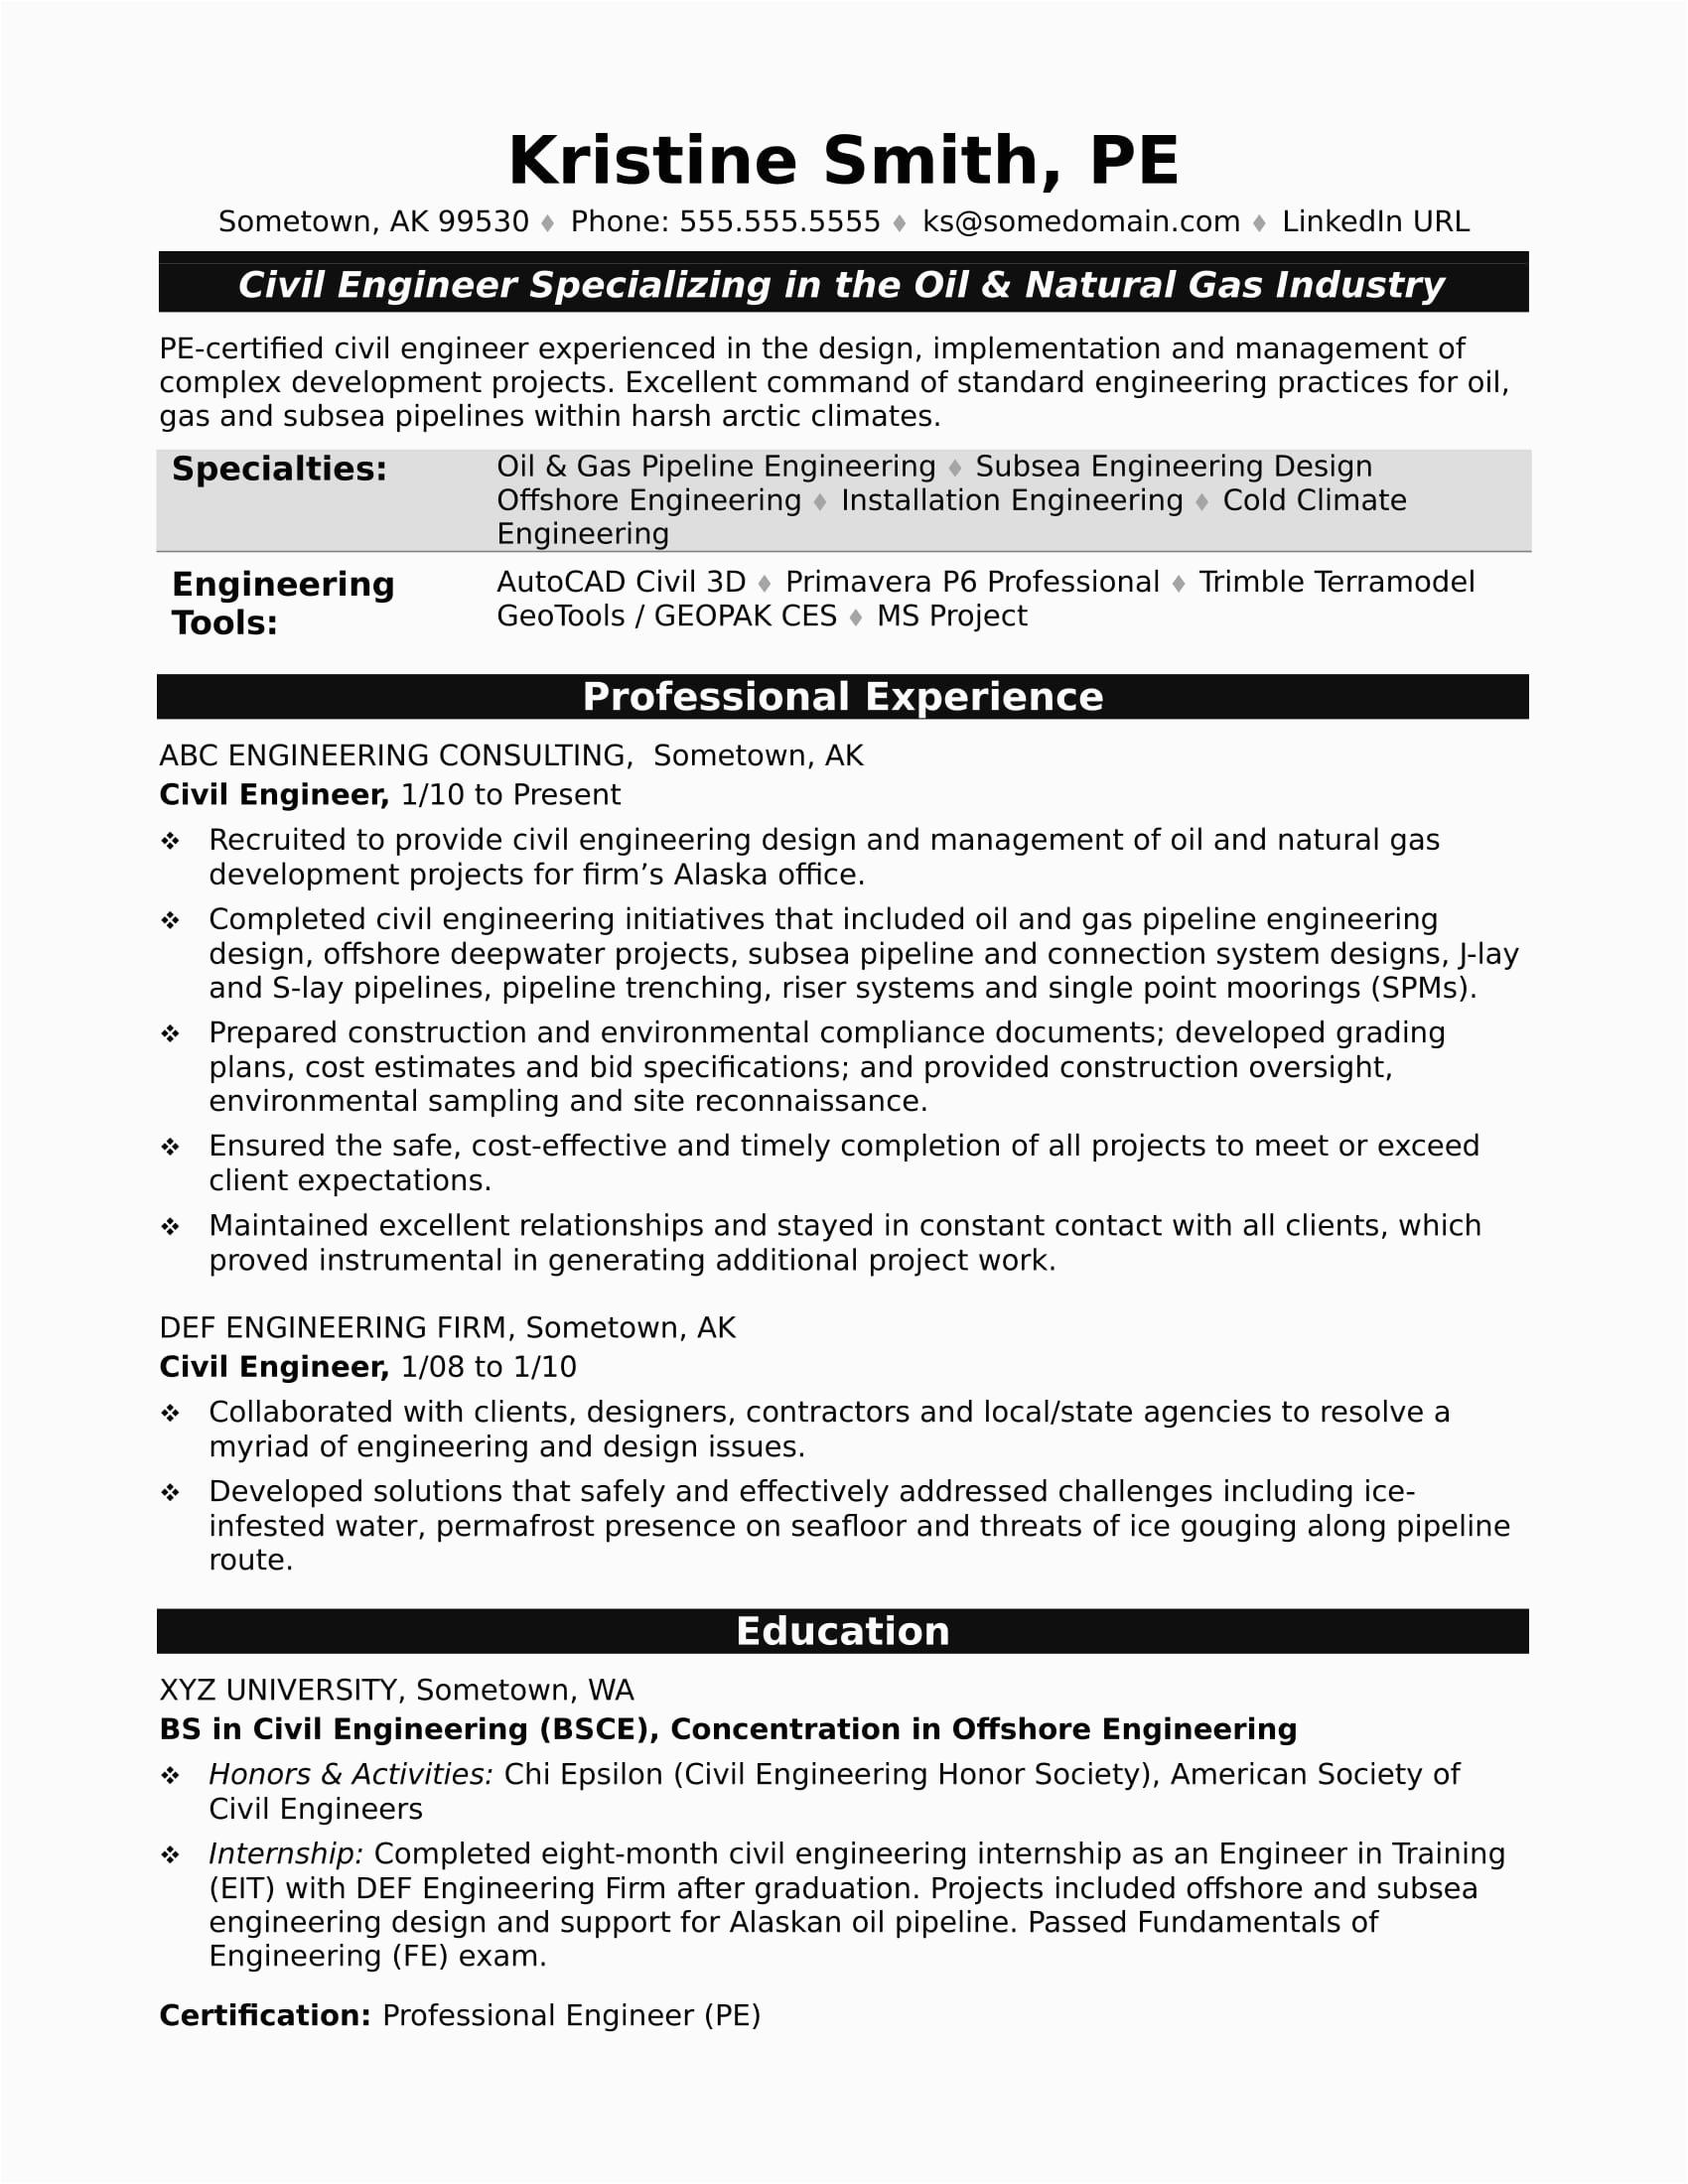 Sample Resume for Civil Engineer Experienced Sample Resume for A Midlevel Civil Engineer